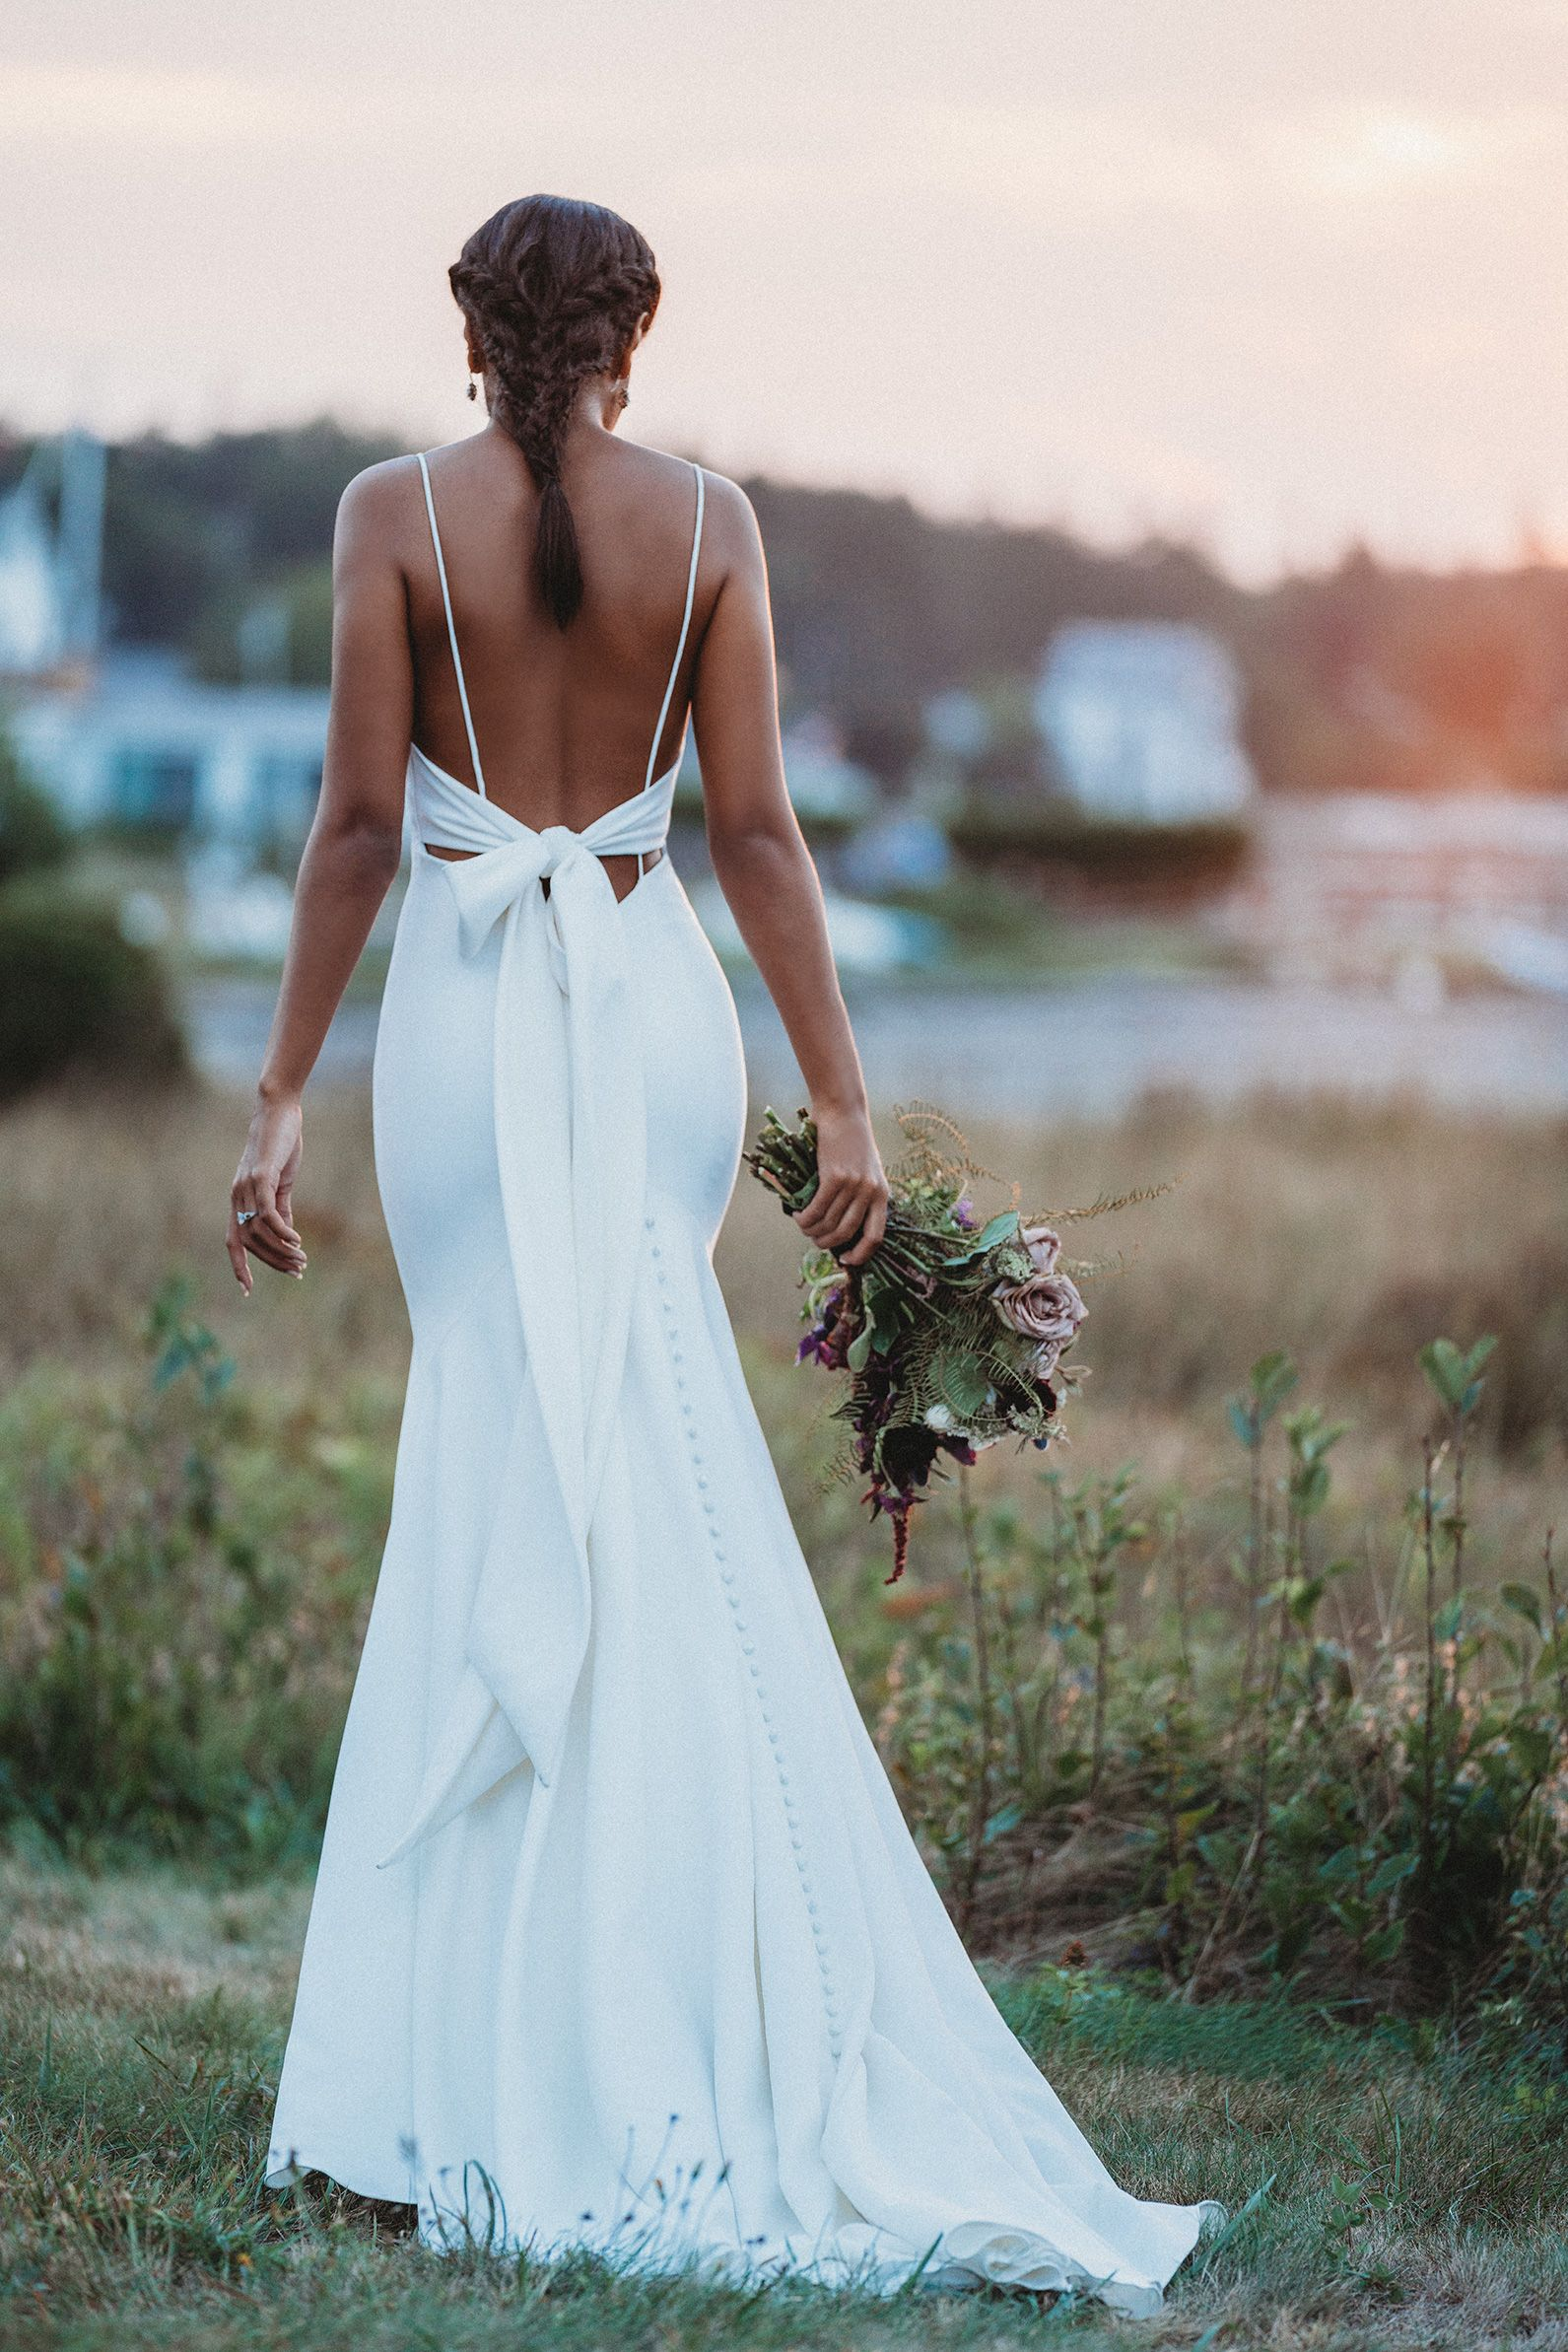 45+ Wedding dress with big bow on back info